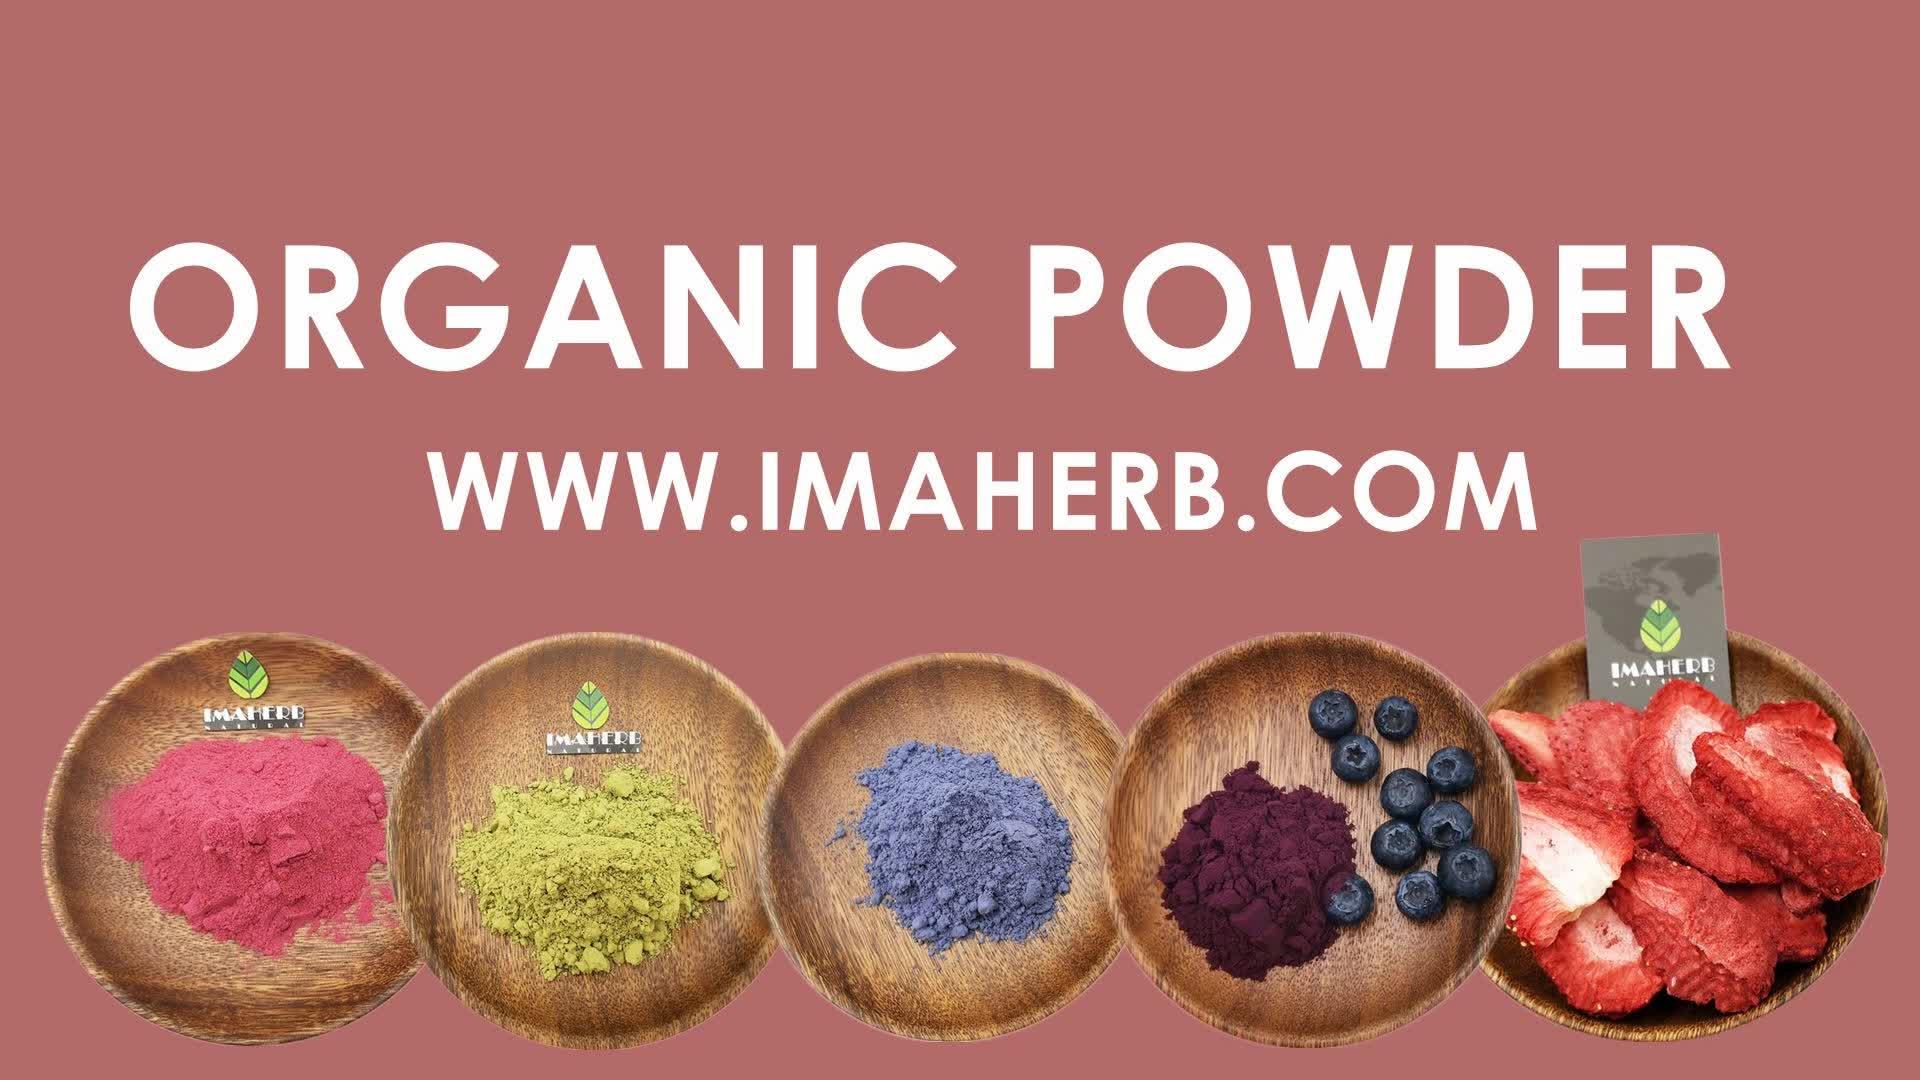 Organik Alami Lavender/Chamomile/Mawar/Rosemary/Calendula/Marigold Bunga Kering